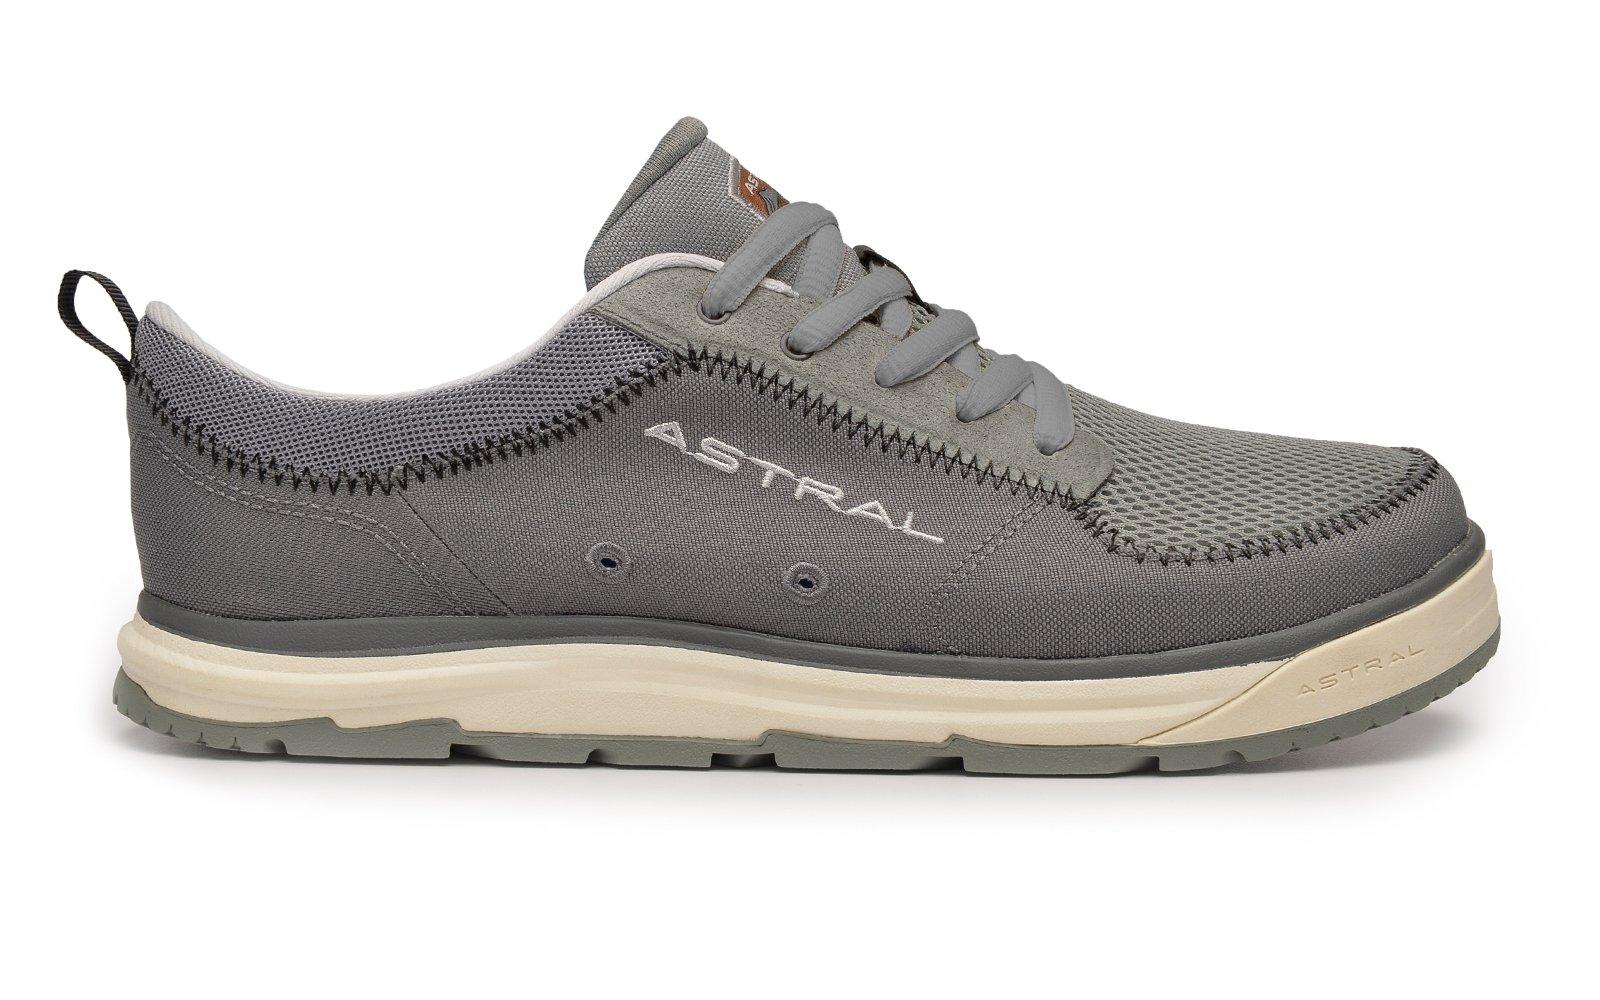 Astral Brewer 2.0 Men's Water Shoe in Storm Grey